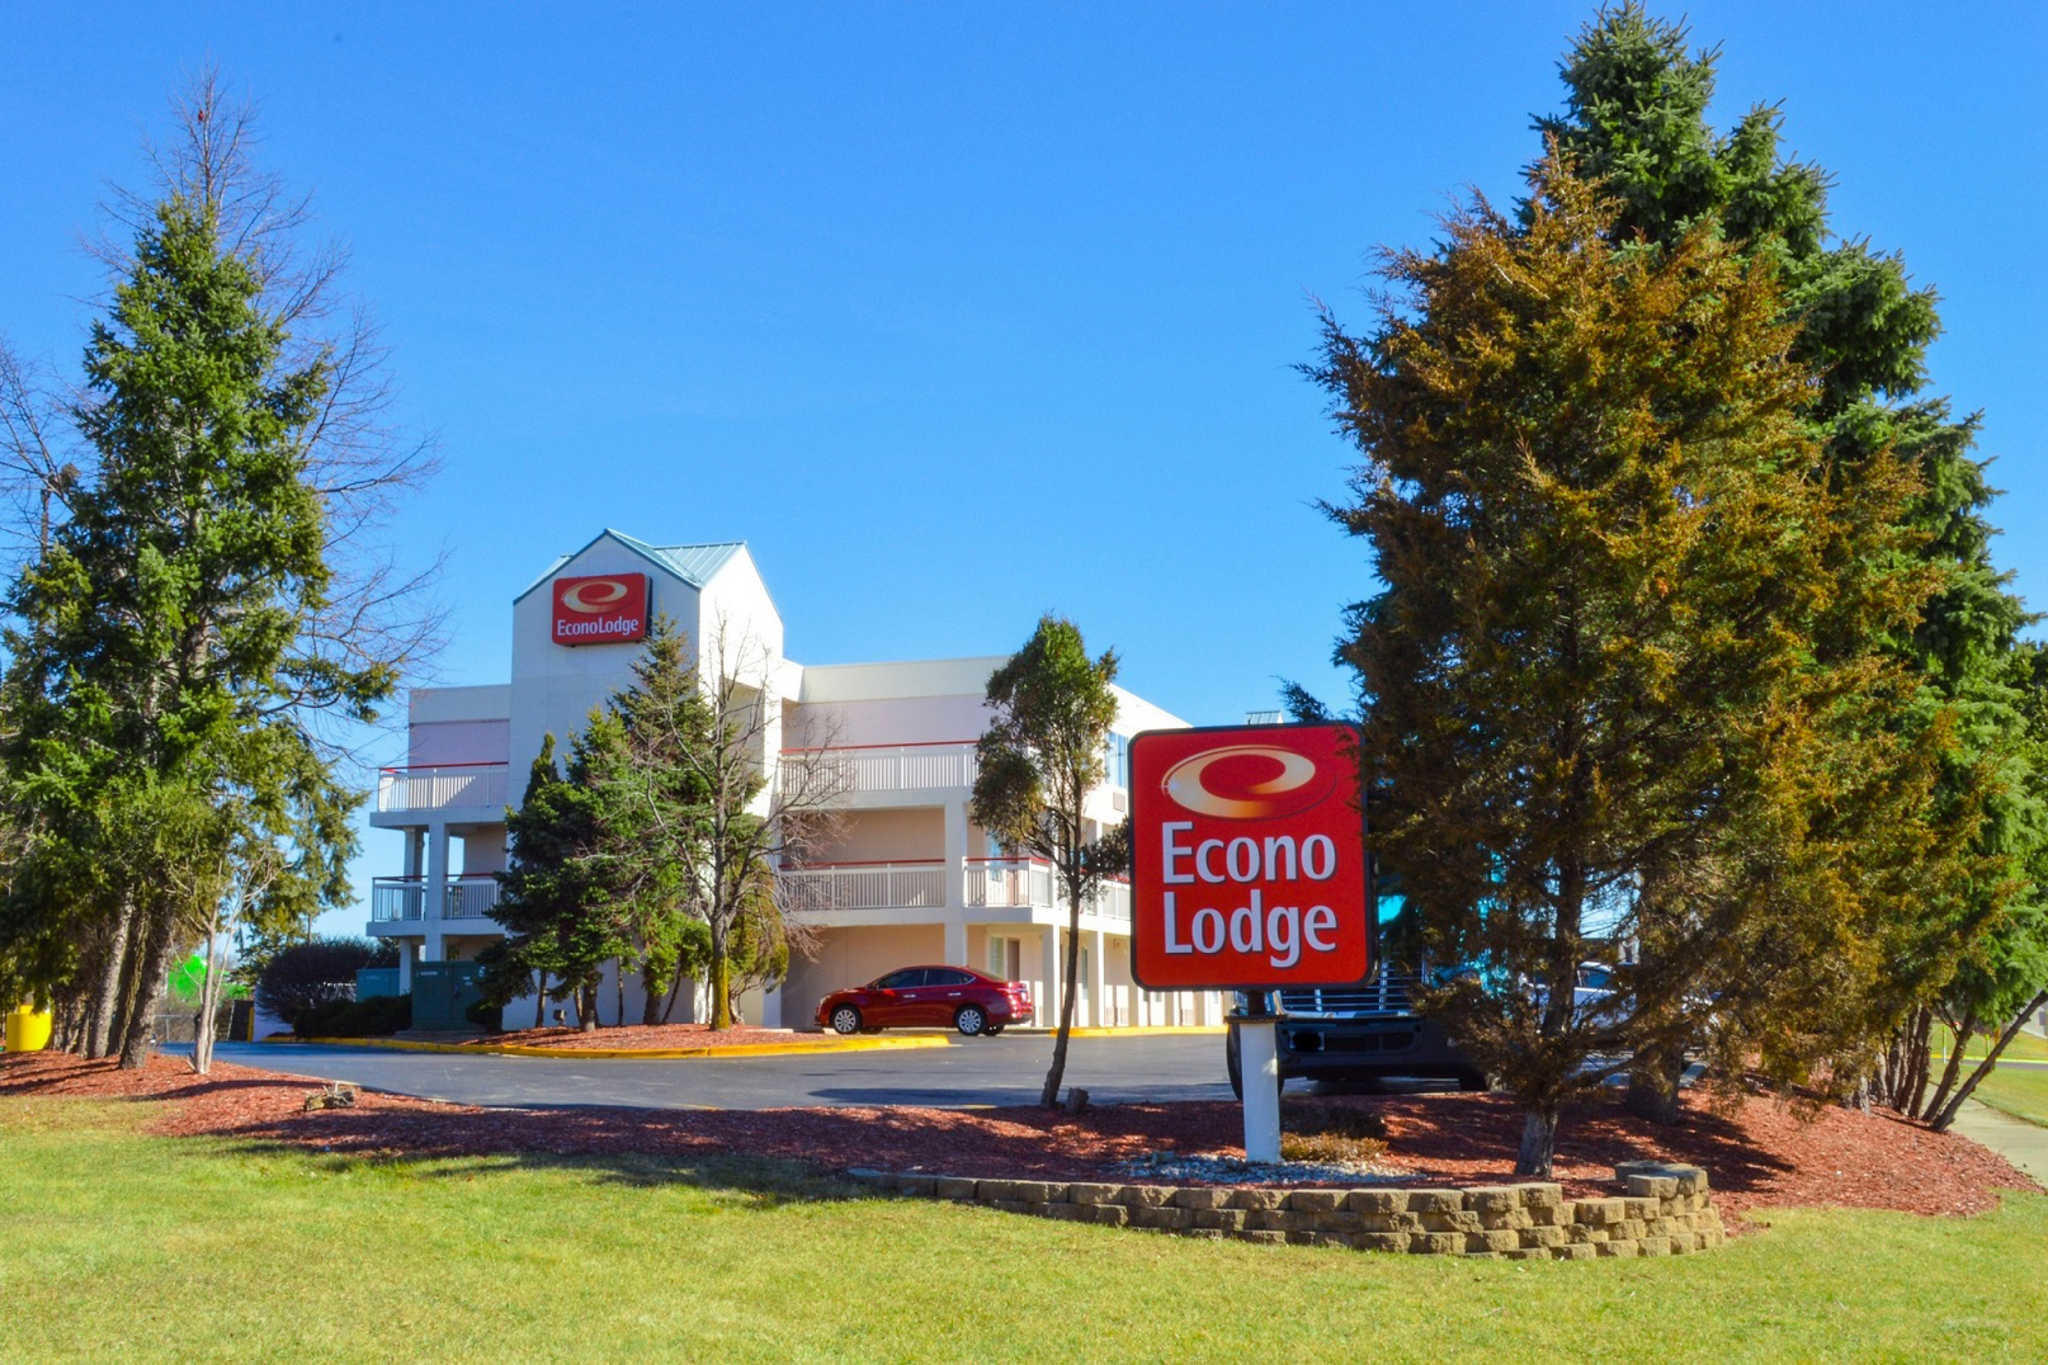 Econo Lodge image 0